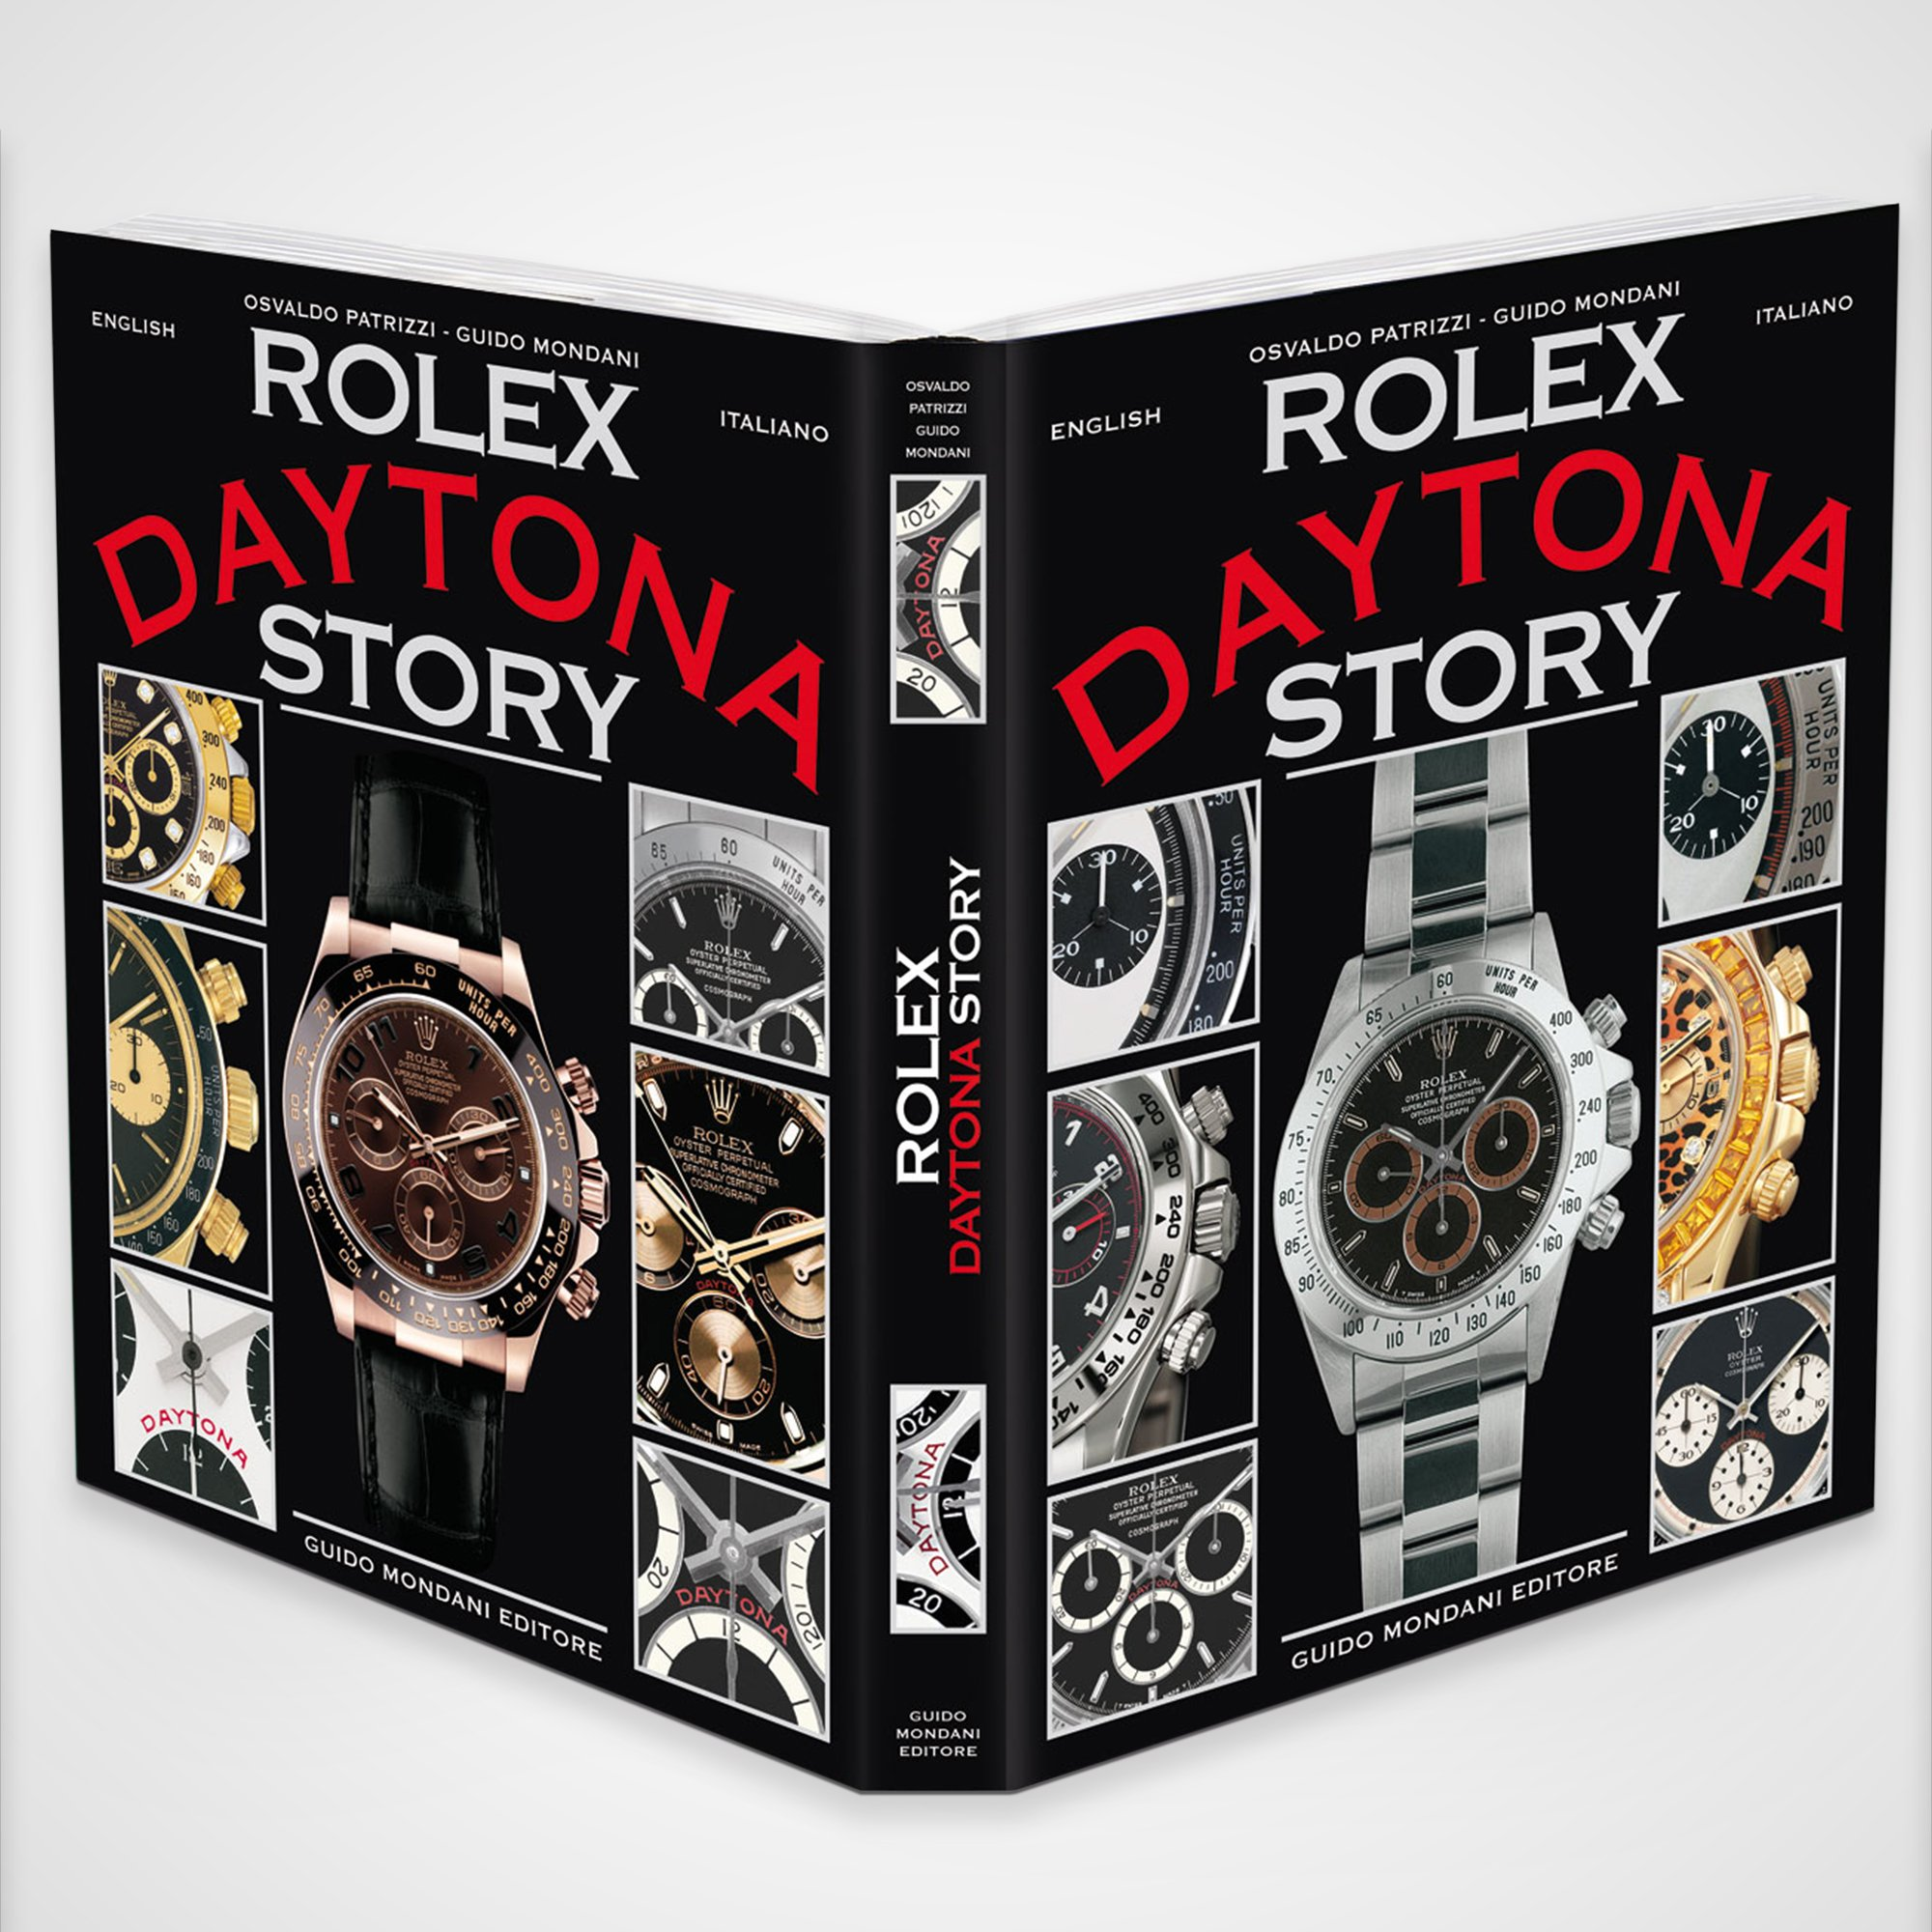 648fa197185 Rolex Daytona Story  Osvaldo Patrizzi